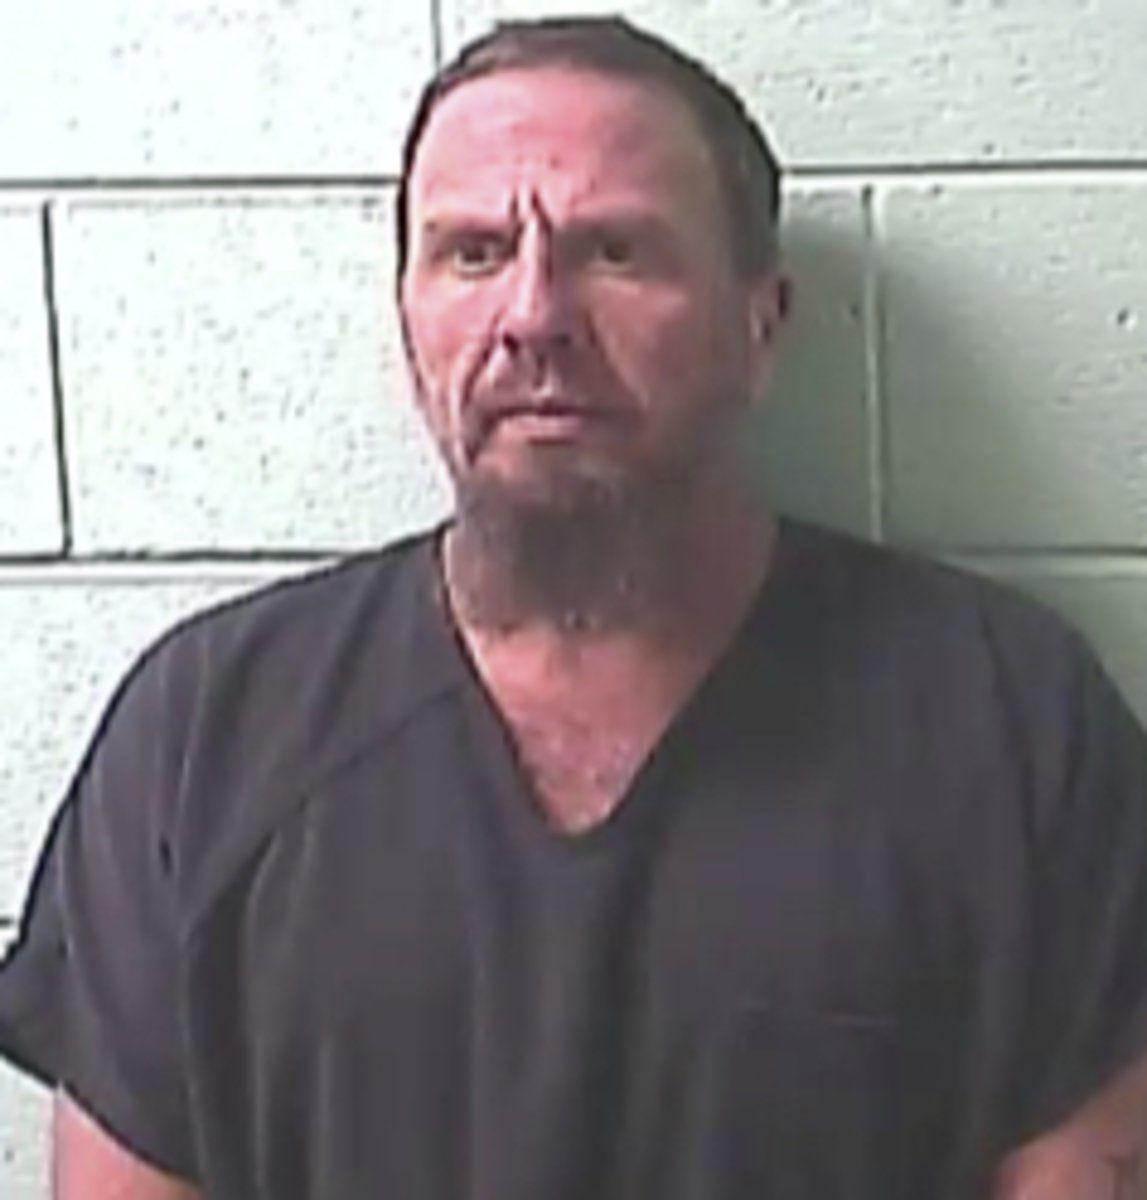 Meth trafficking bust in Benton results in 2 arrests